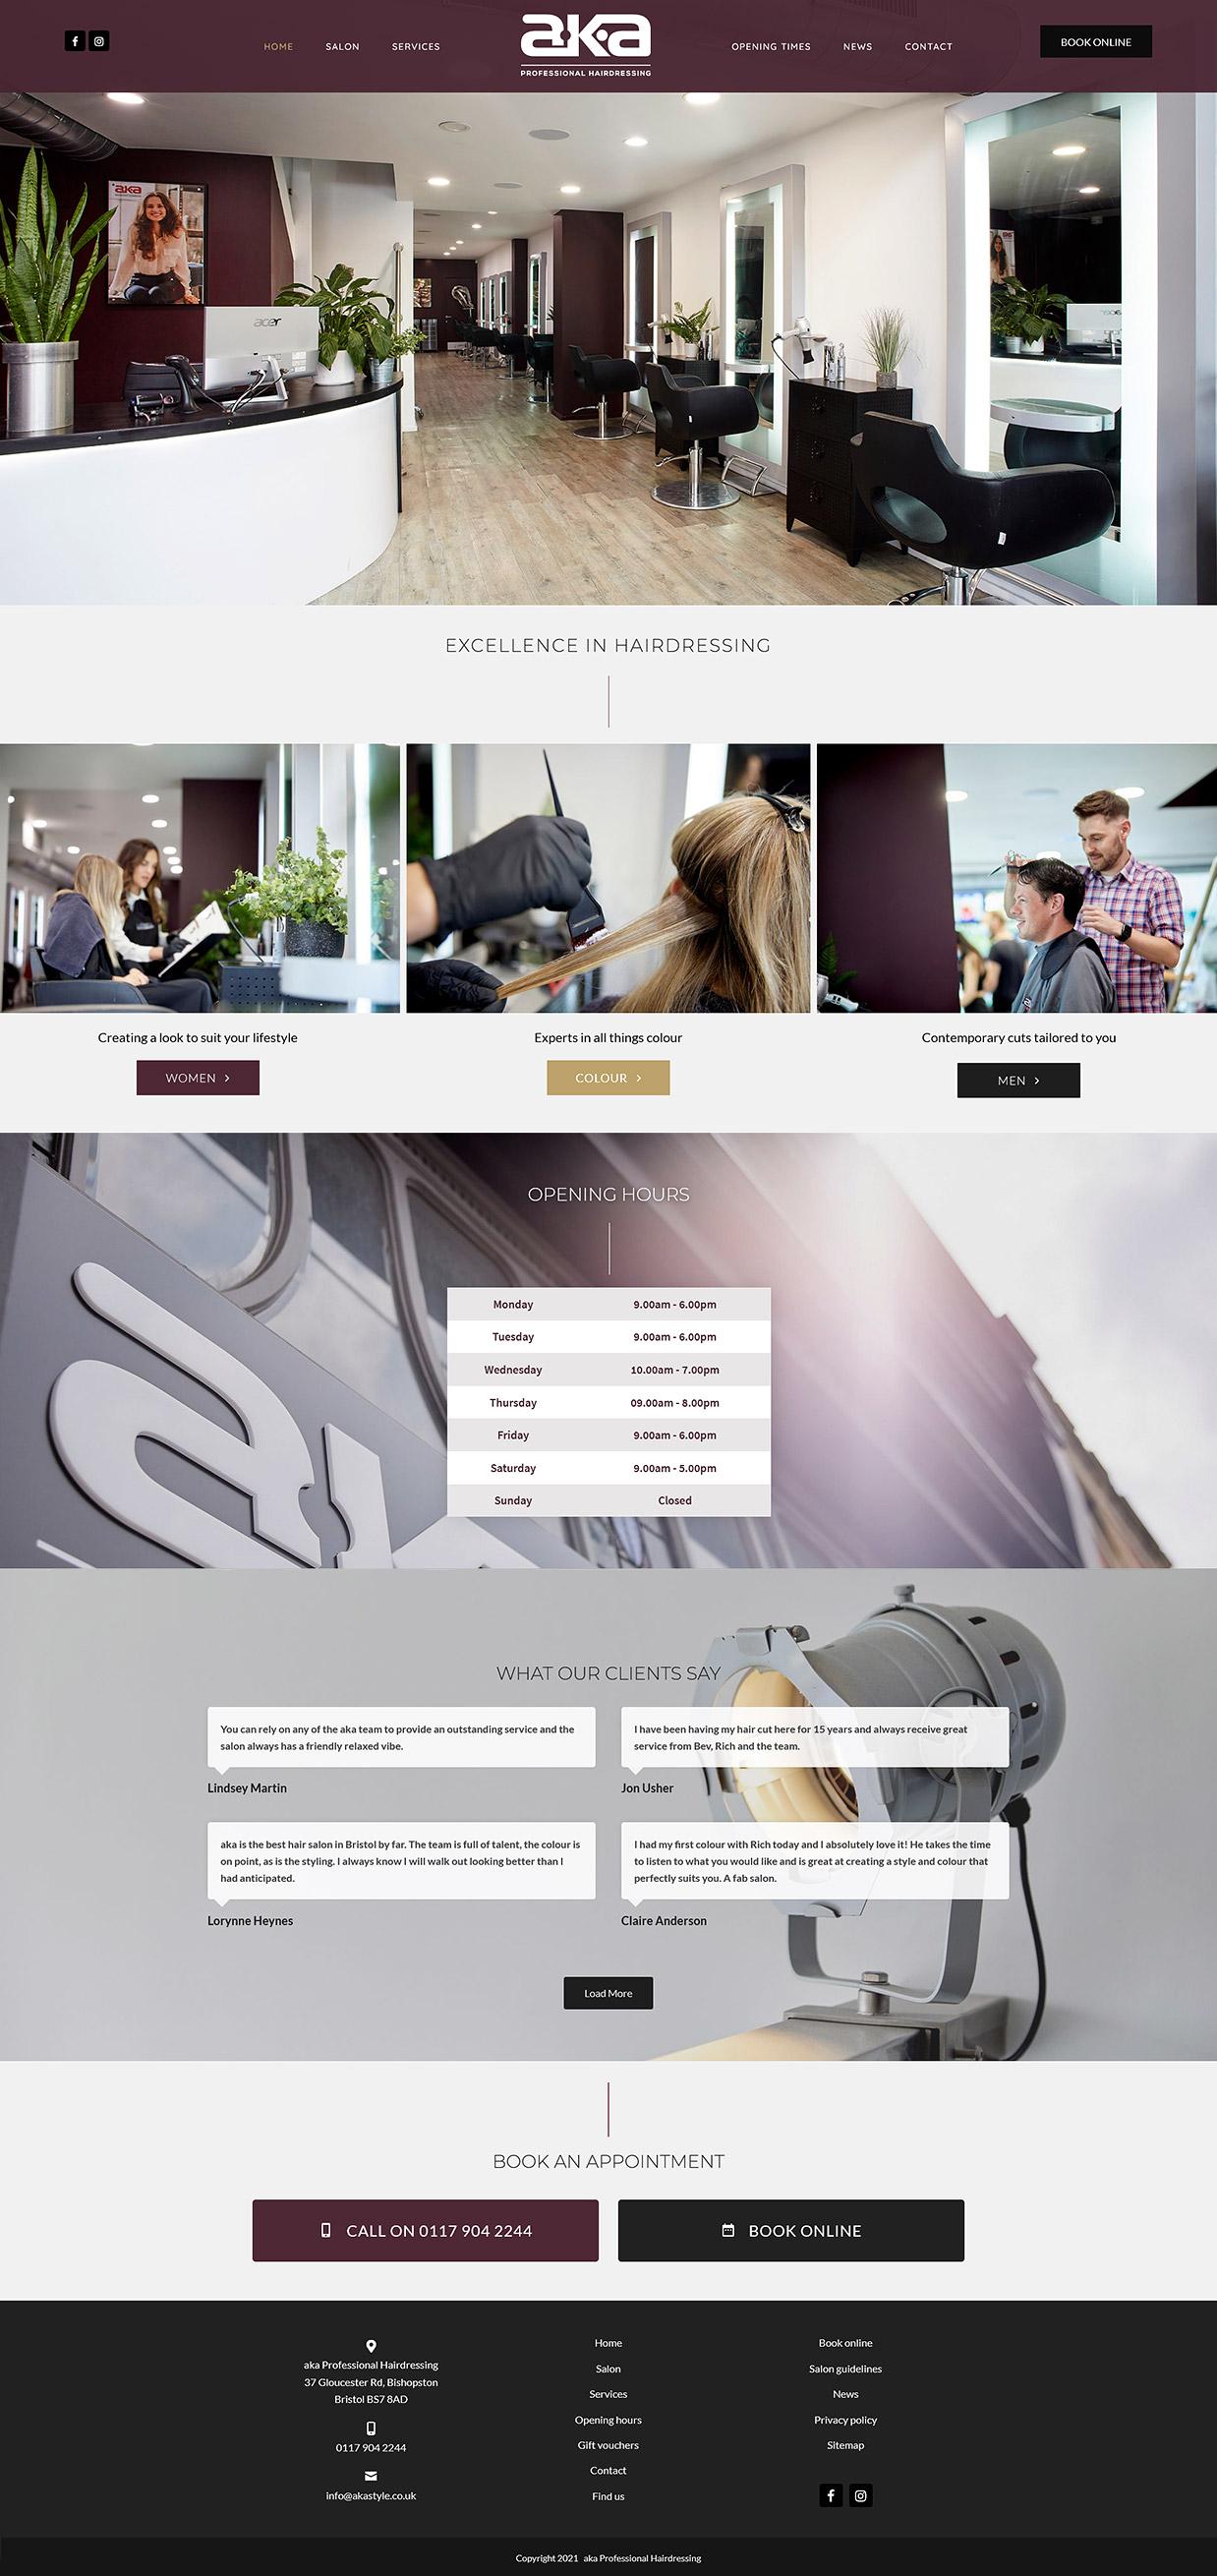 Website screenshot - aka hairdressing website home page design